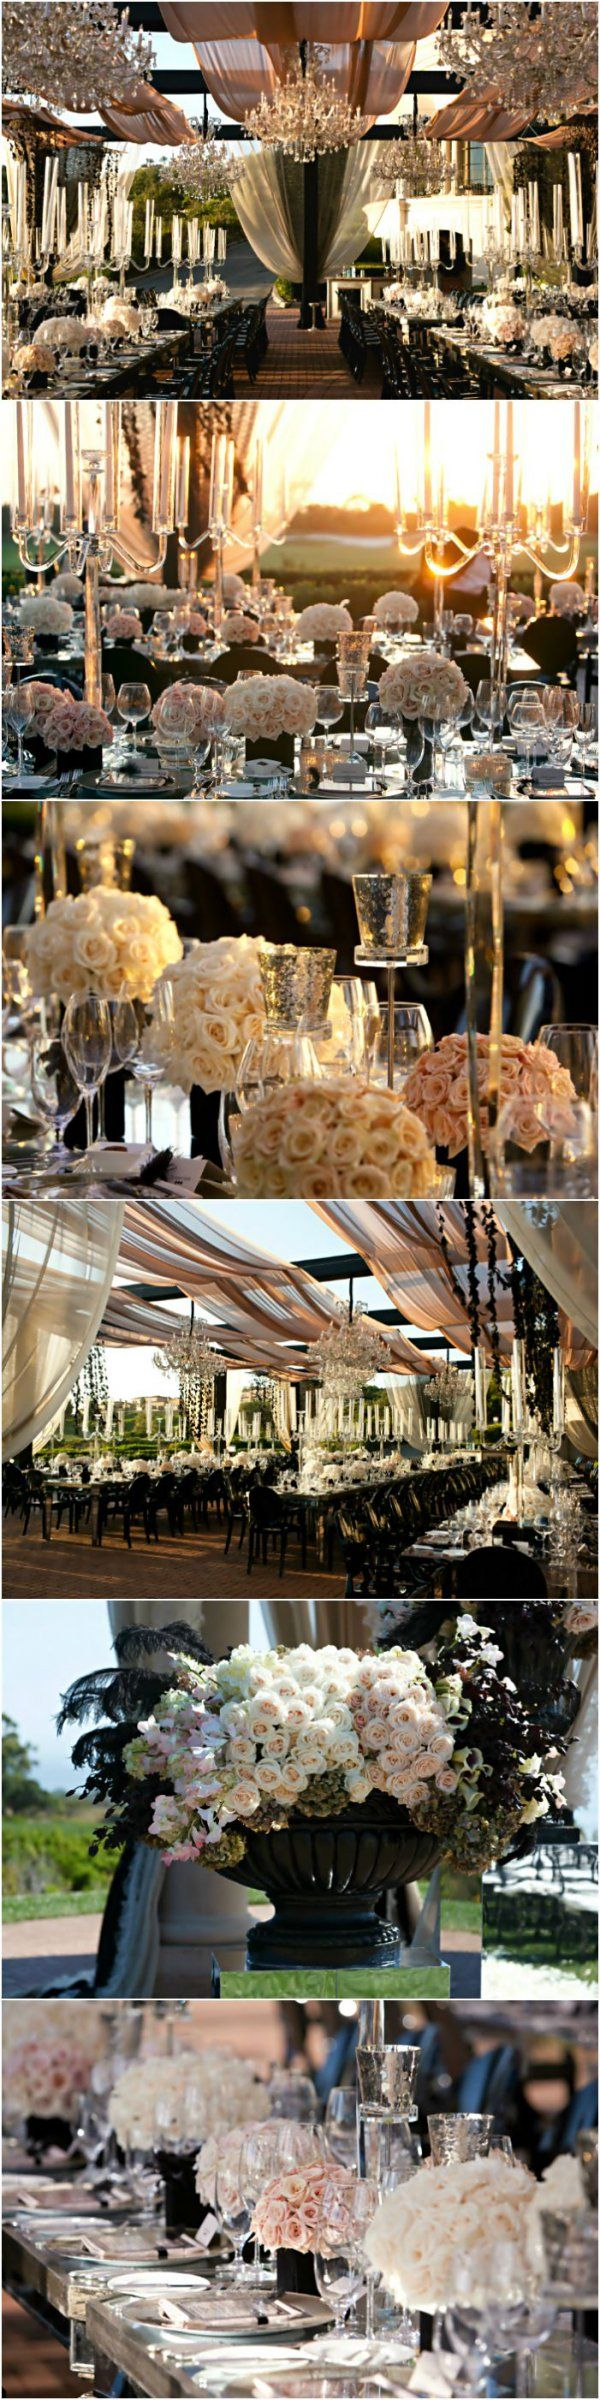 Sala weselna - zoom na dekoracje!